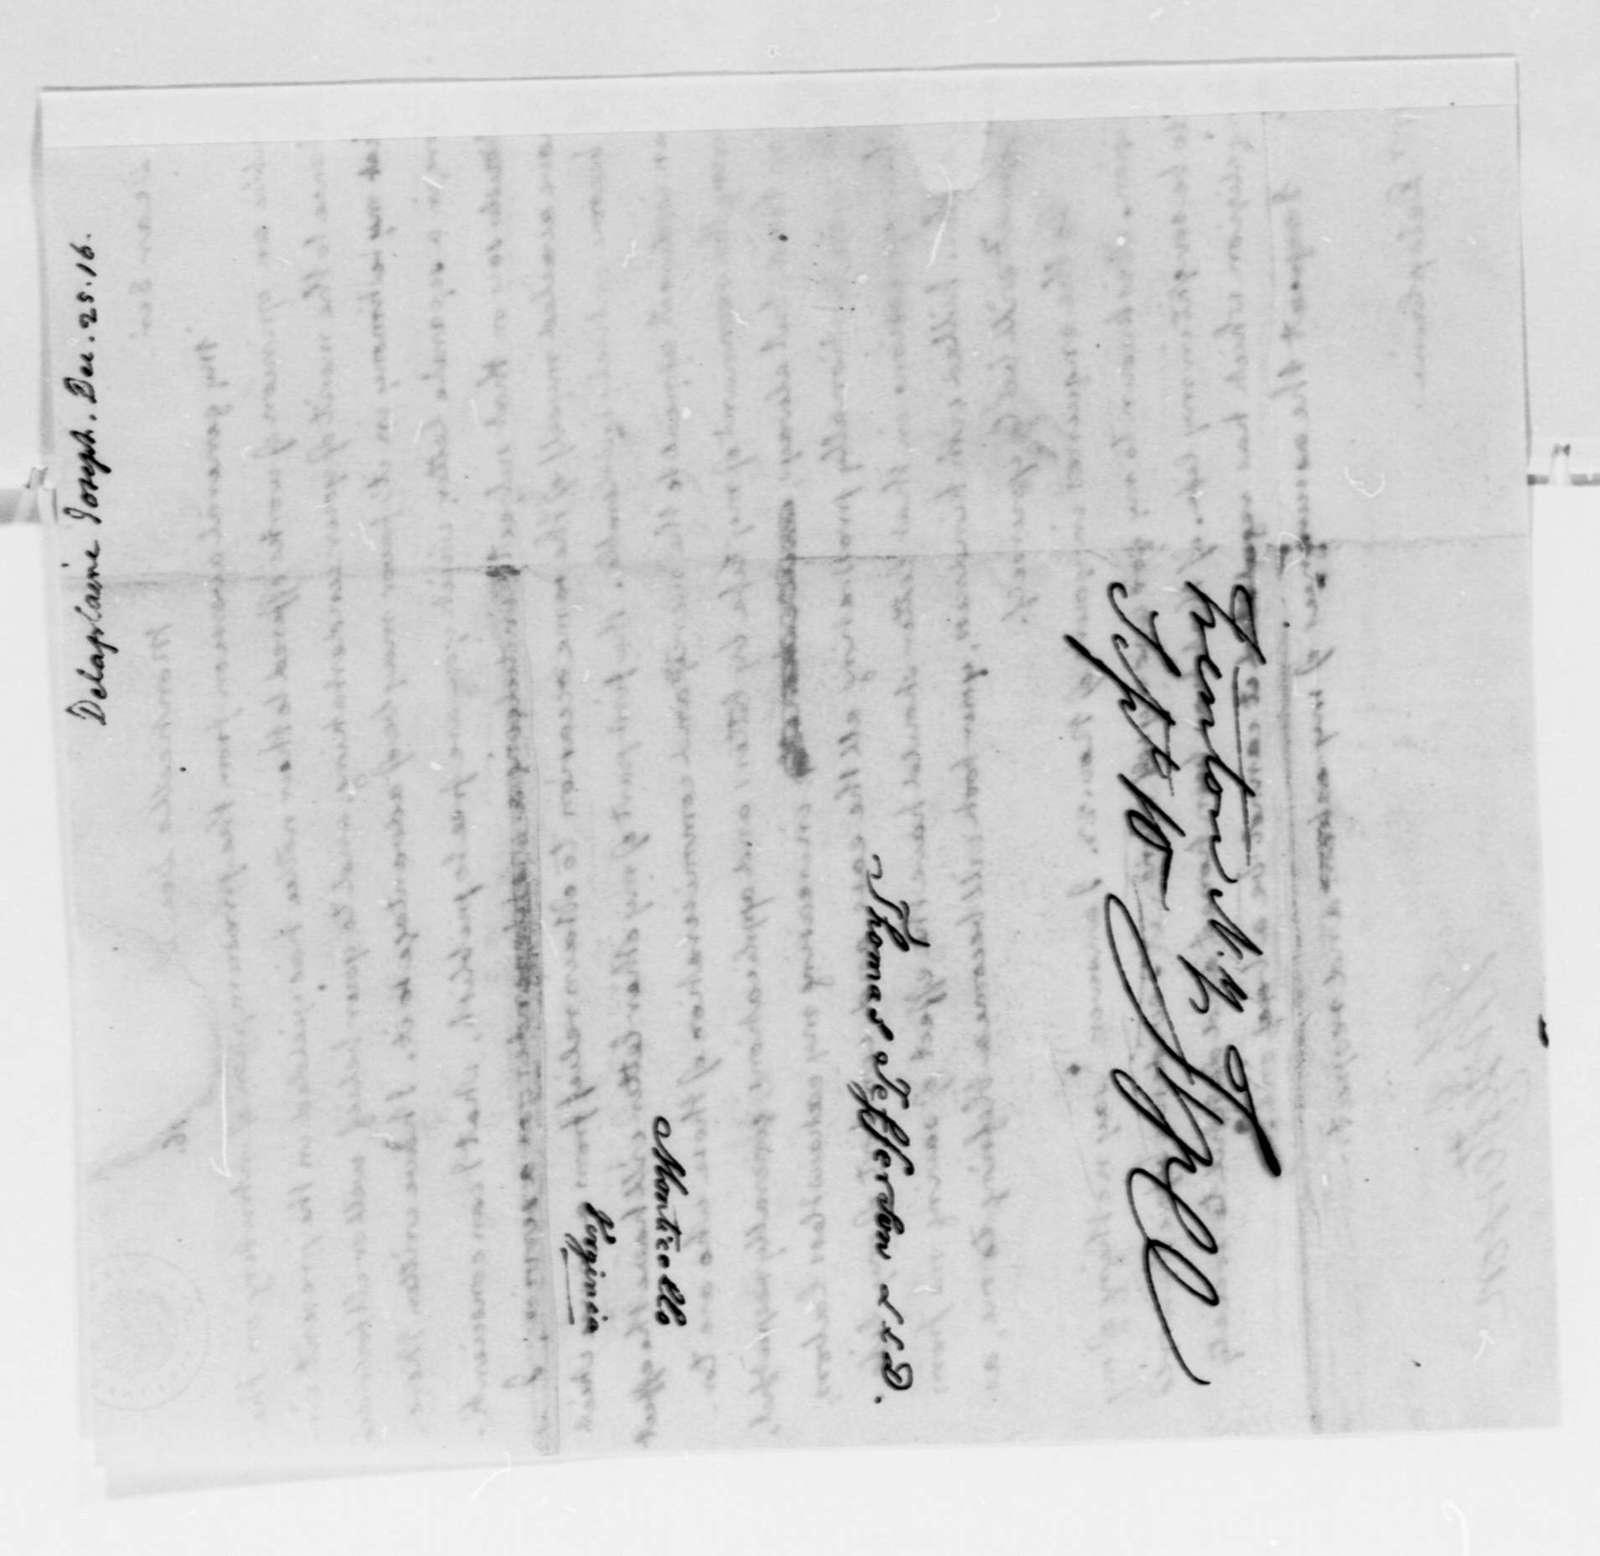 Thomas Jefferson to Joseph Delaplaine, December 25, 1816